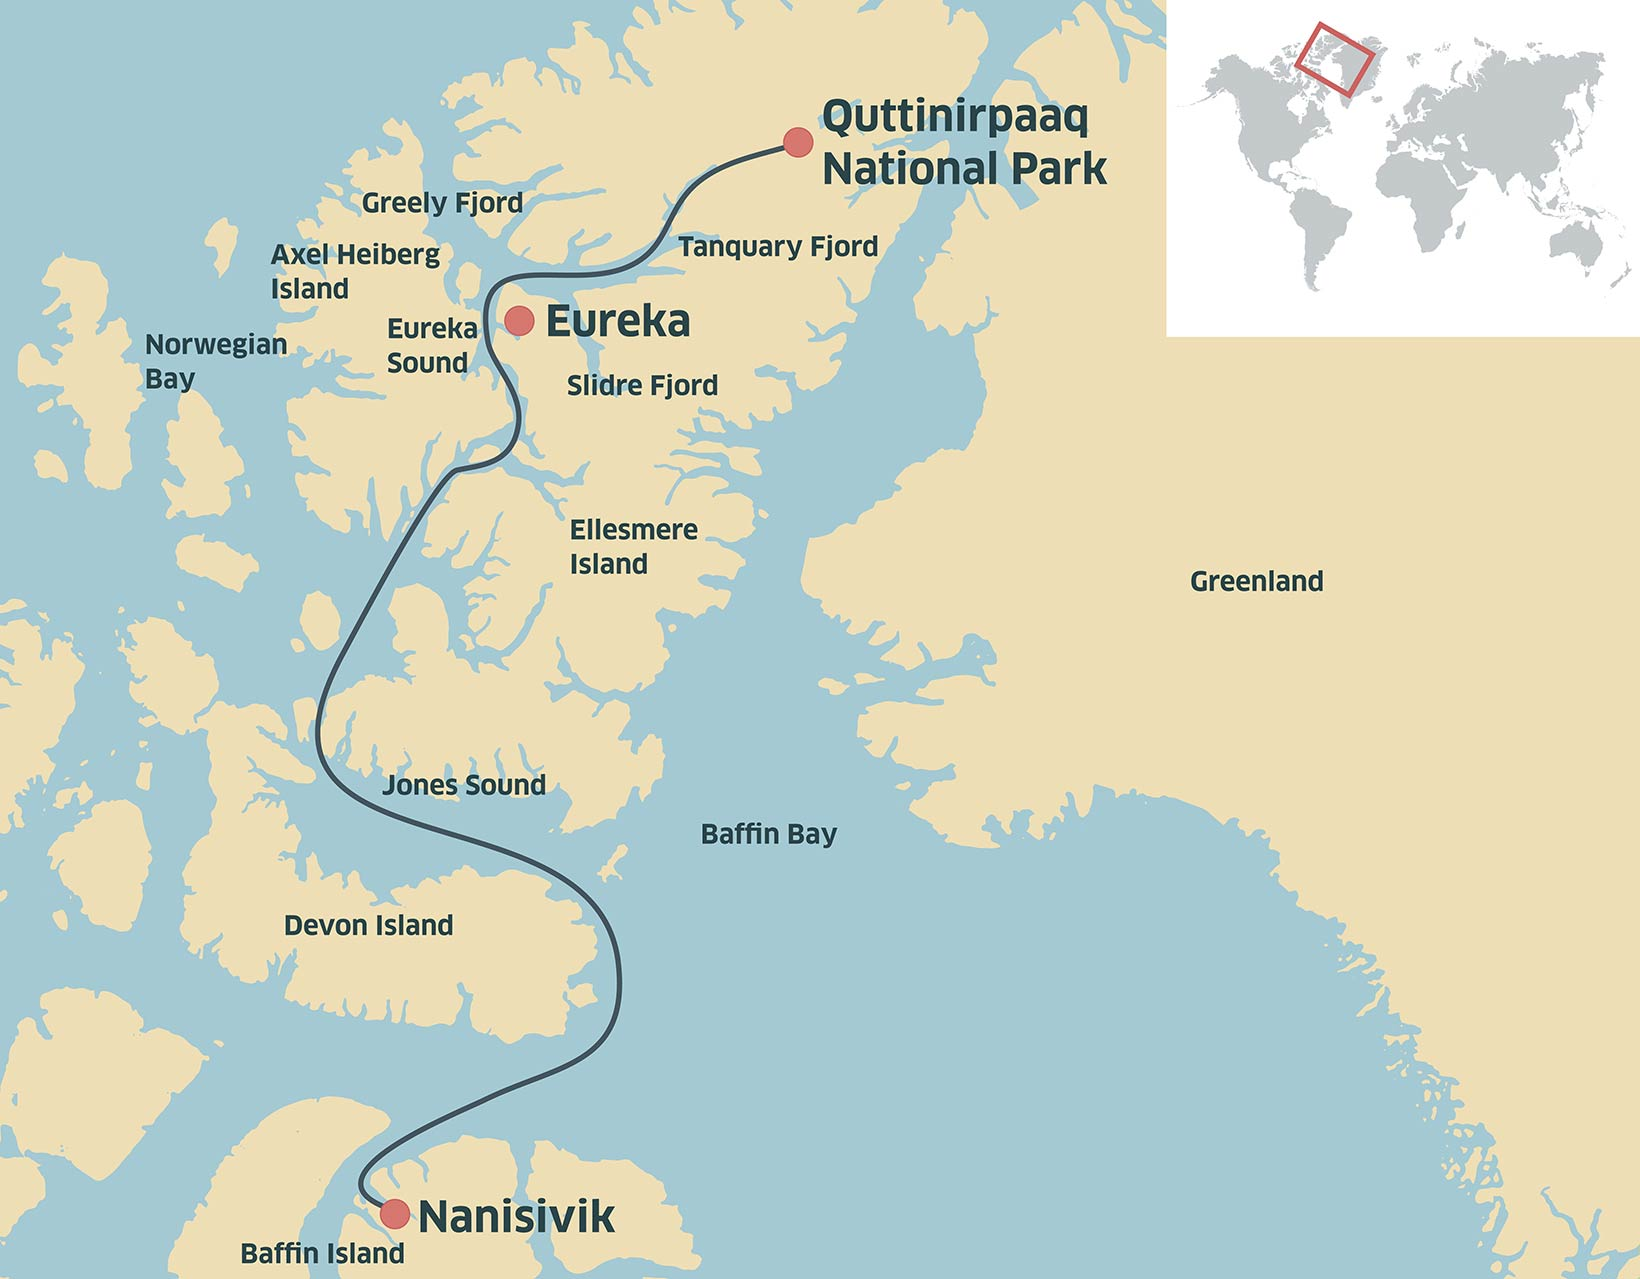 Quttinirpaaq map